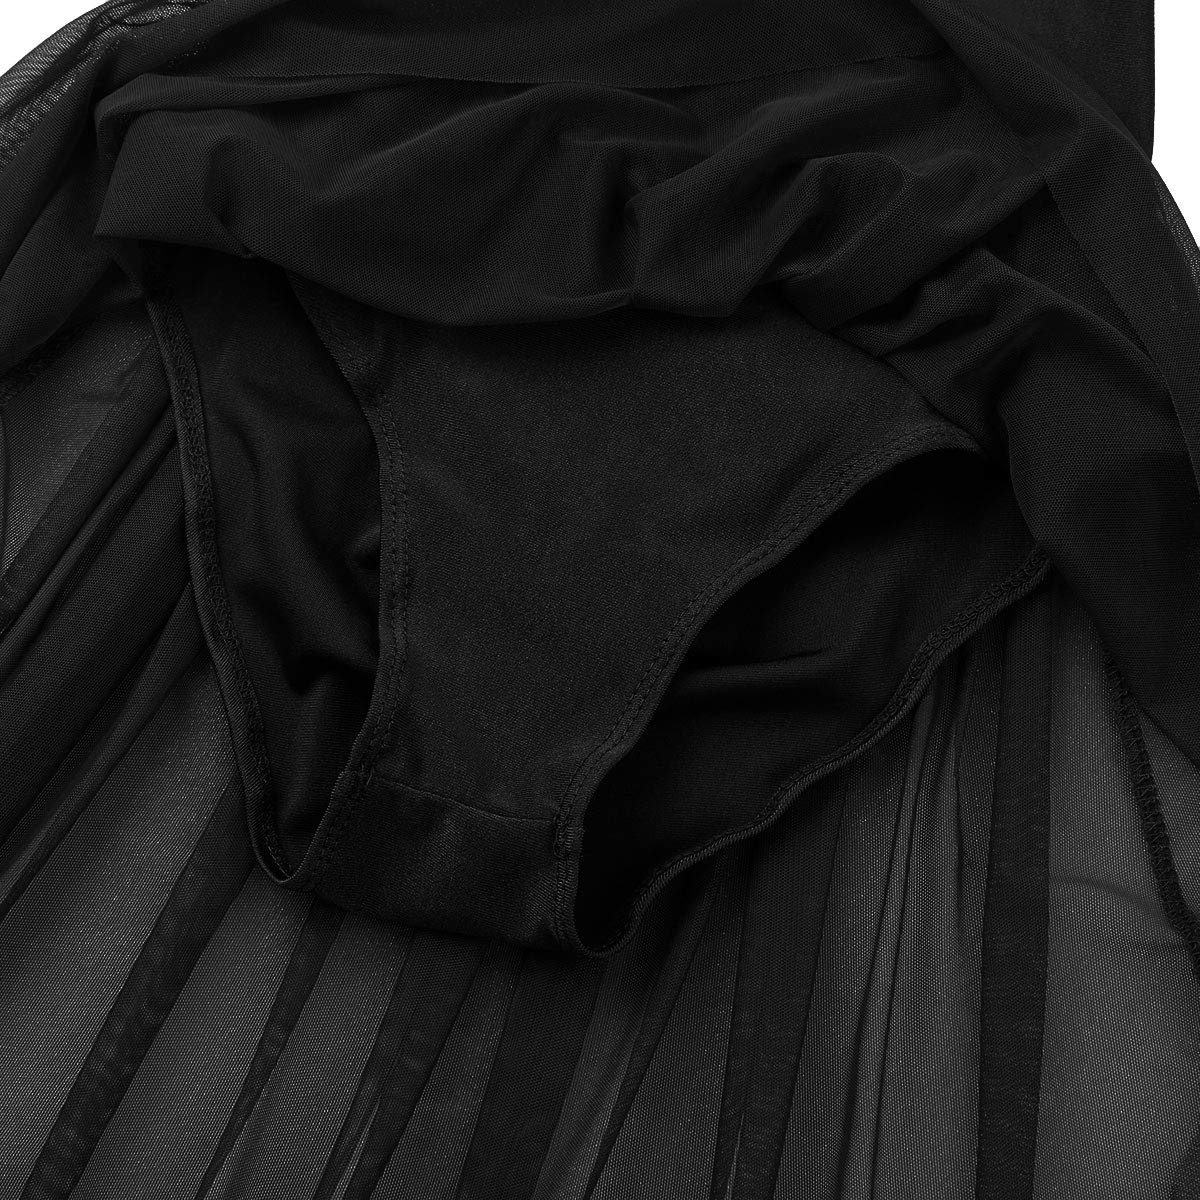 3df757780e02a CHICTRY Robe Danse Latine Fille Robe Danseuse Robe Danse de Salon Rumba  Zumba Salsa Robe de ...